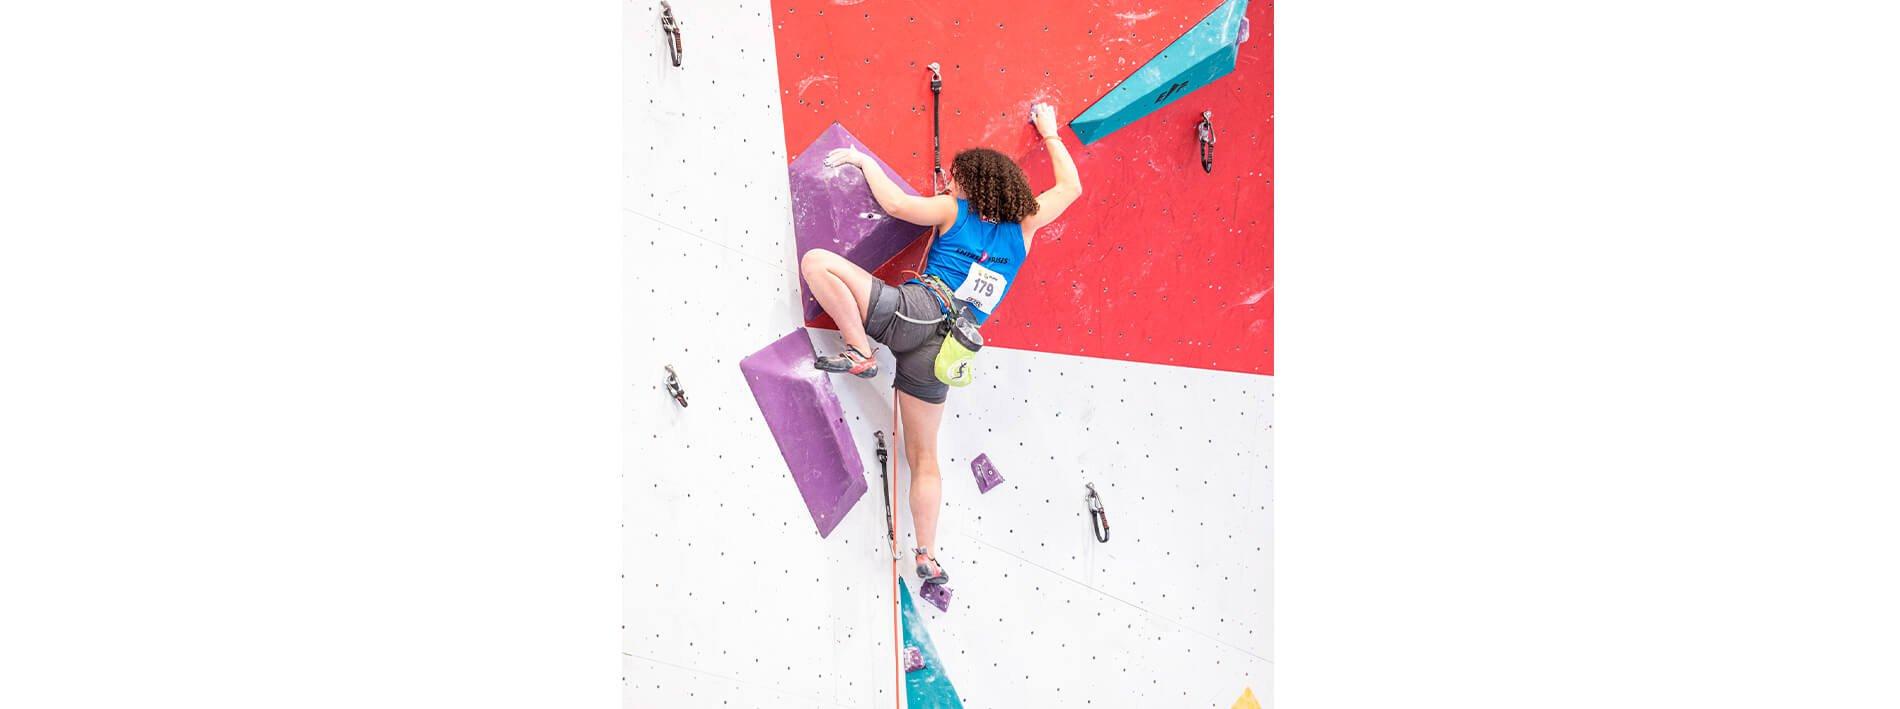 Escalada no olimpica img3